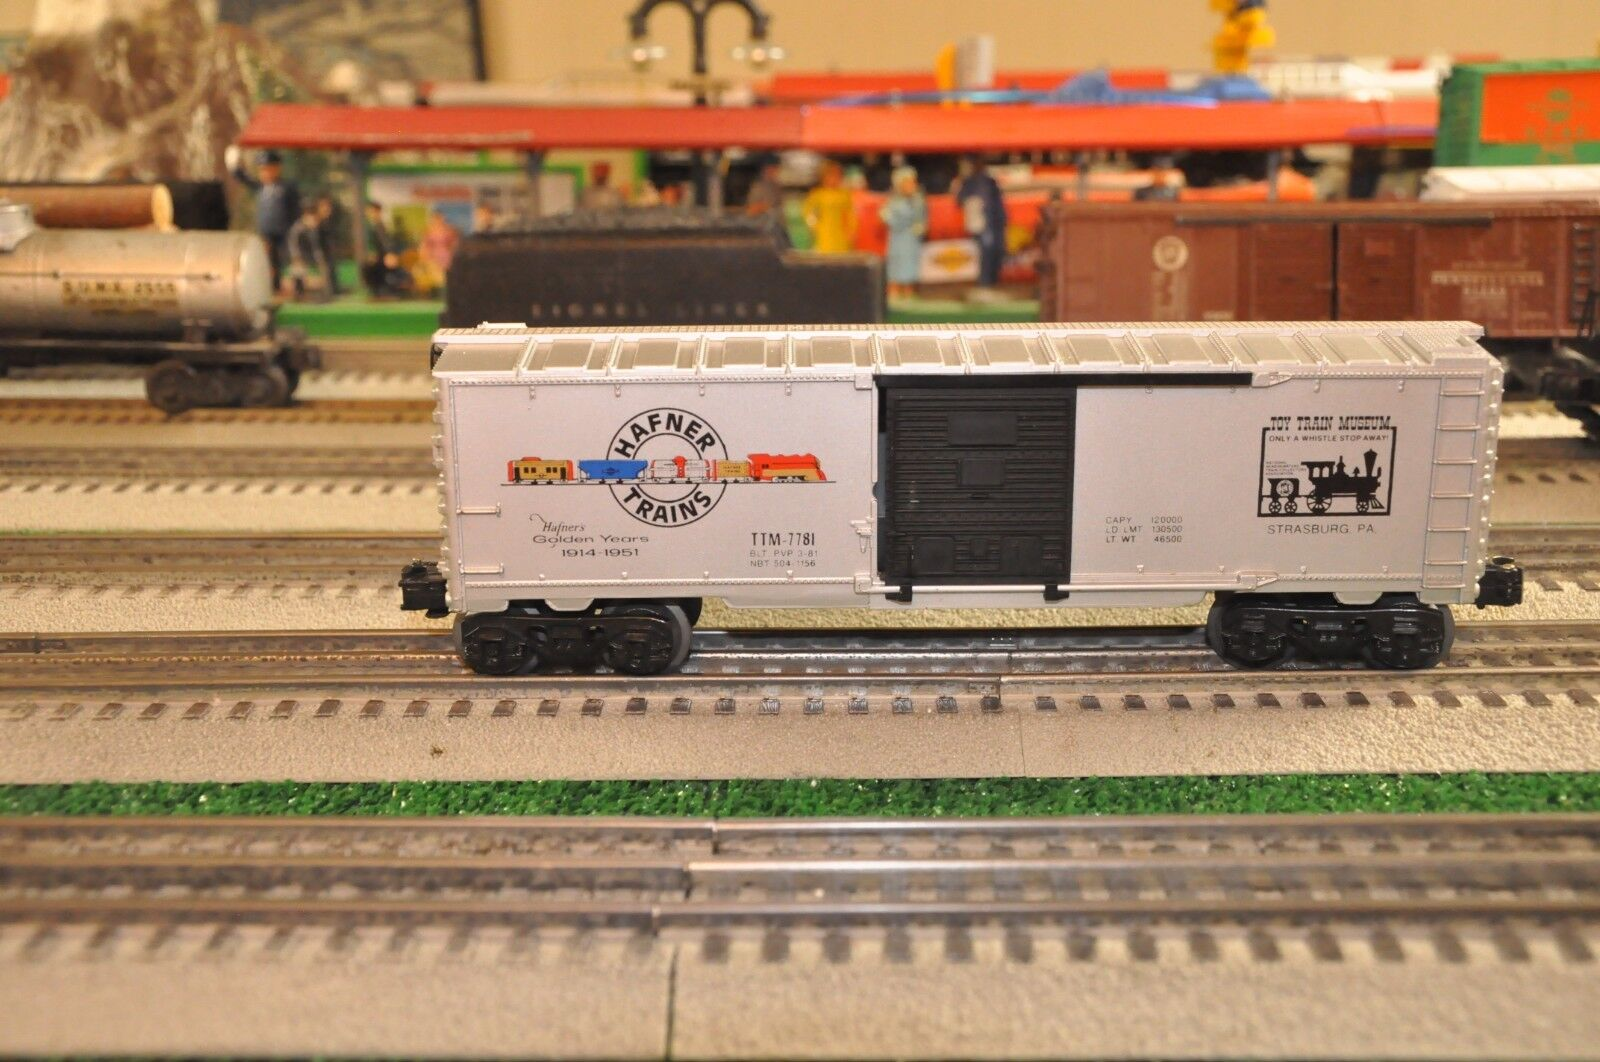 Tren Lionel TTM-7781 TCA Juguete Museo Furgón de 1981 pintado por PVP impresión